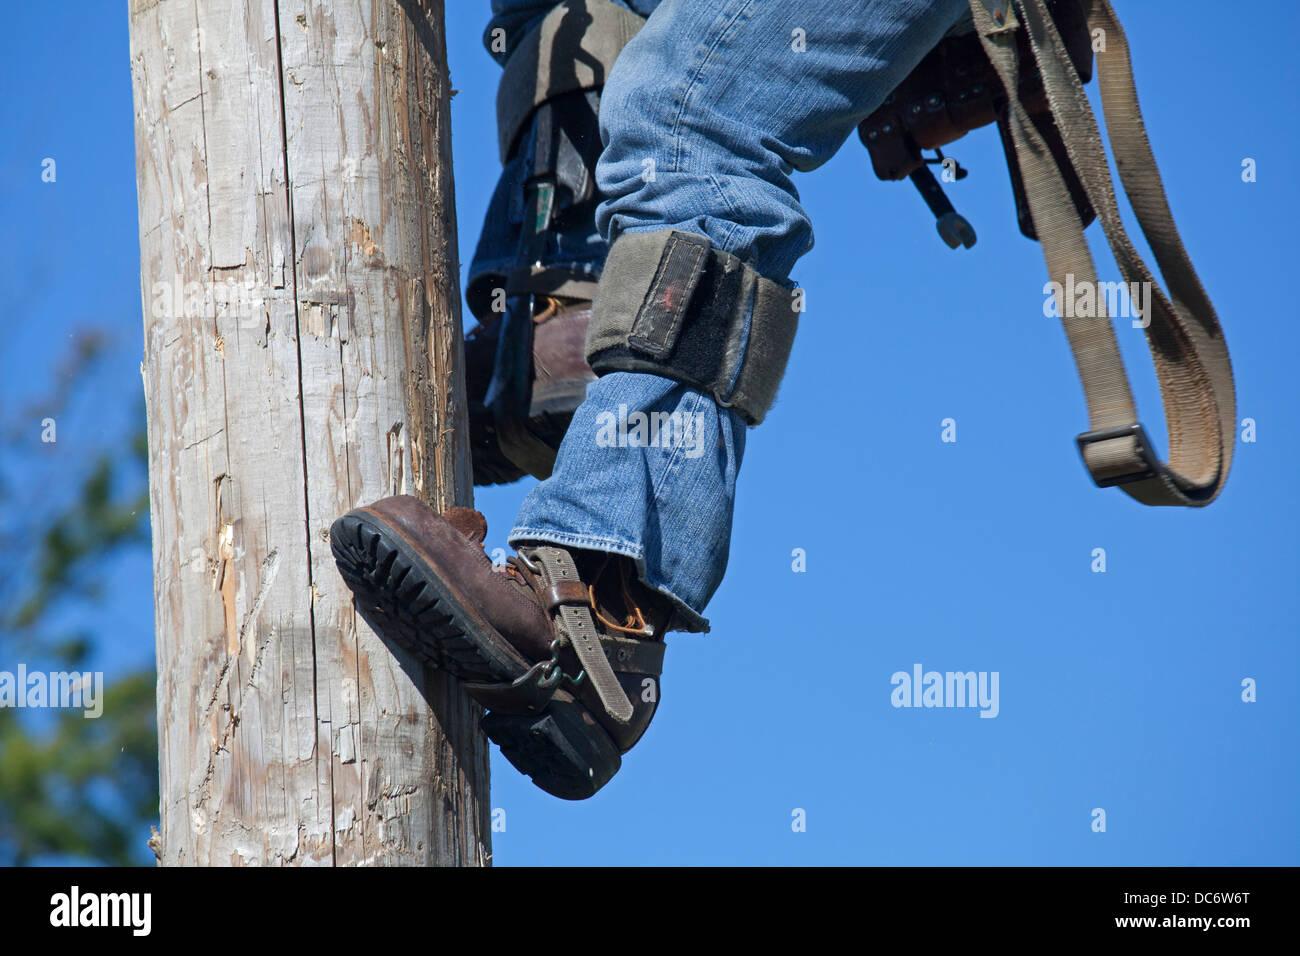 Electric utility linemen climb poles to make repairs ...